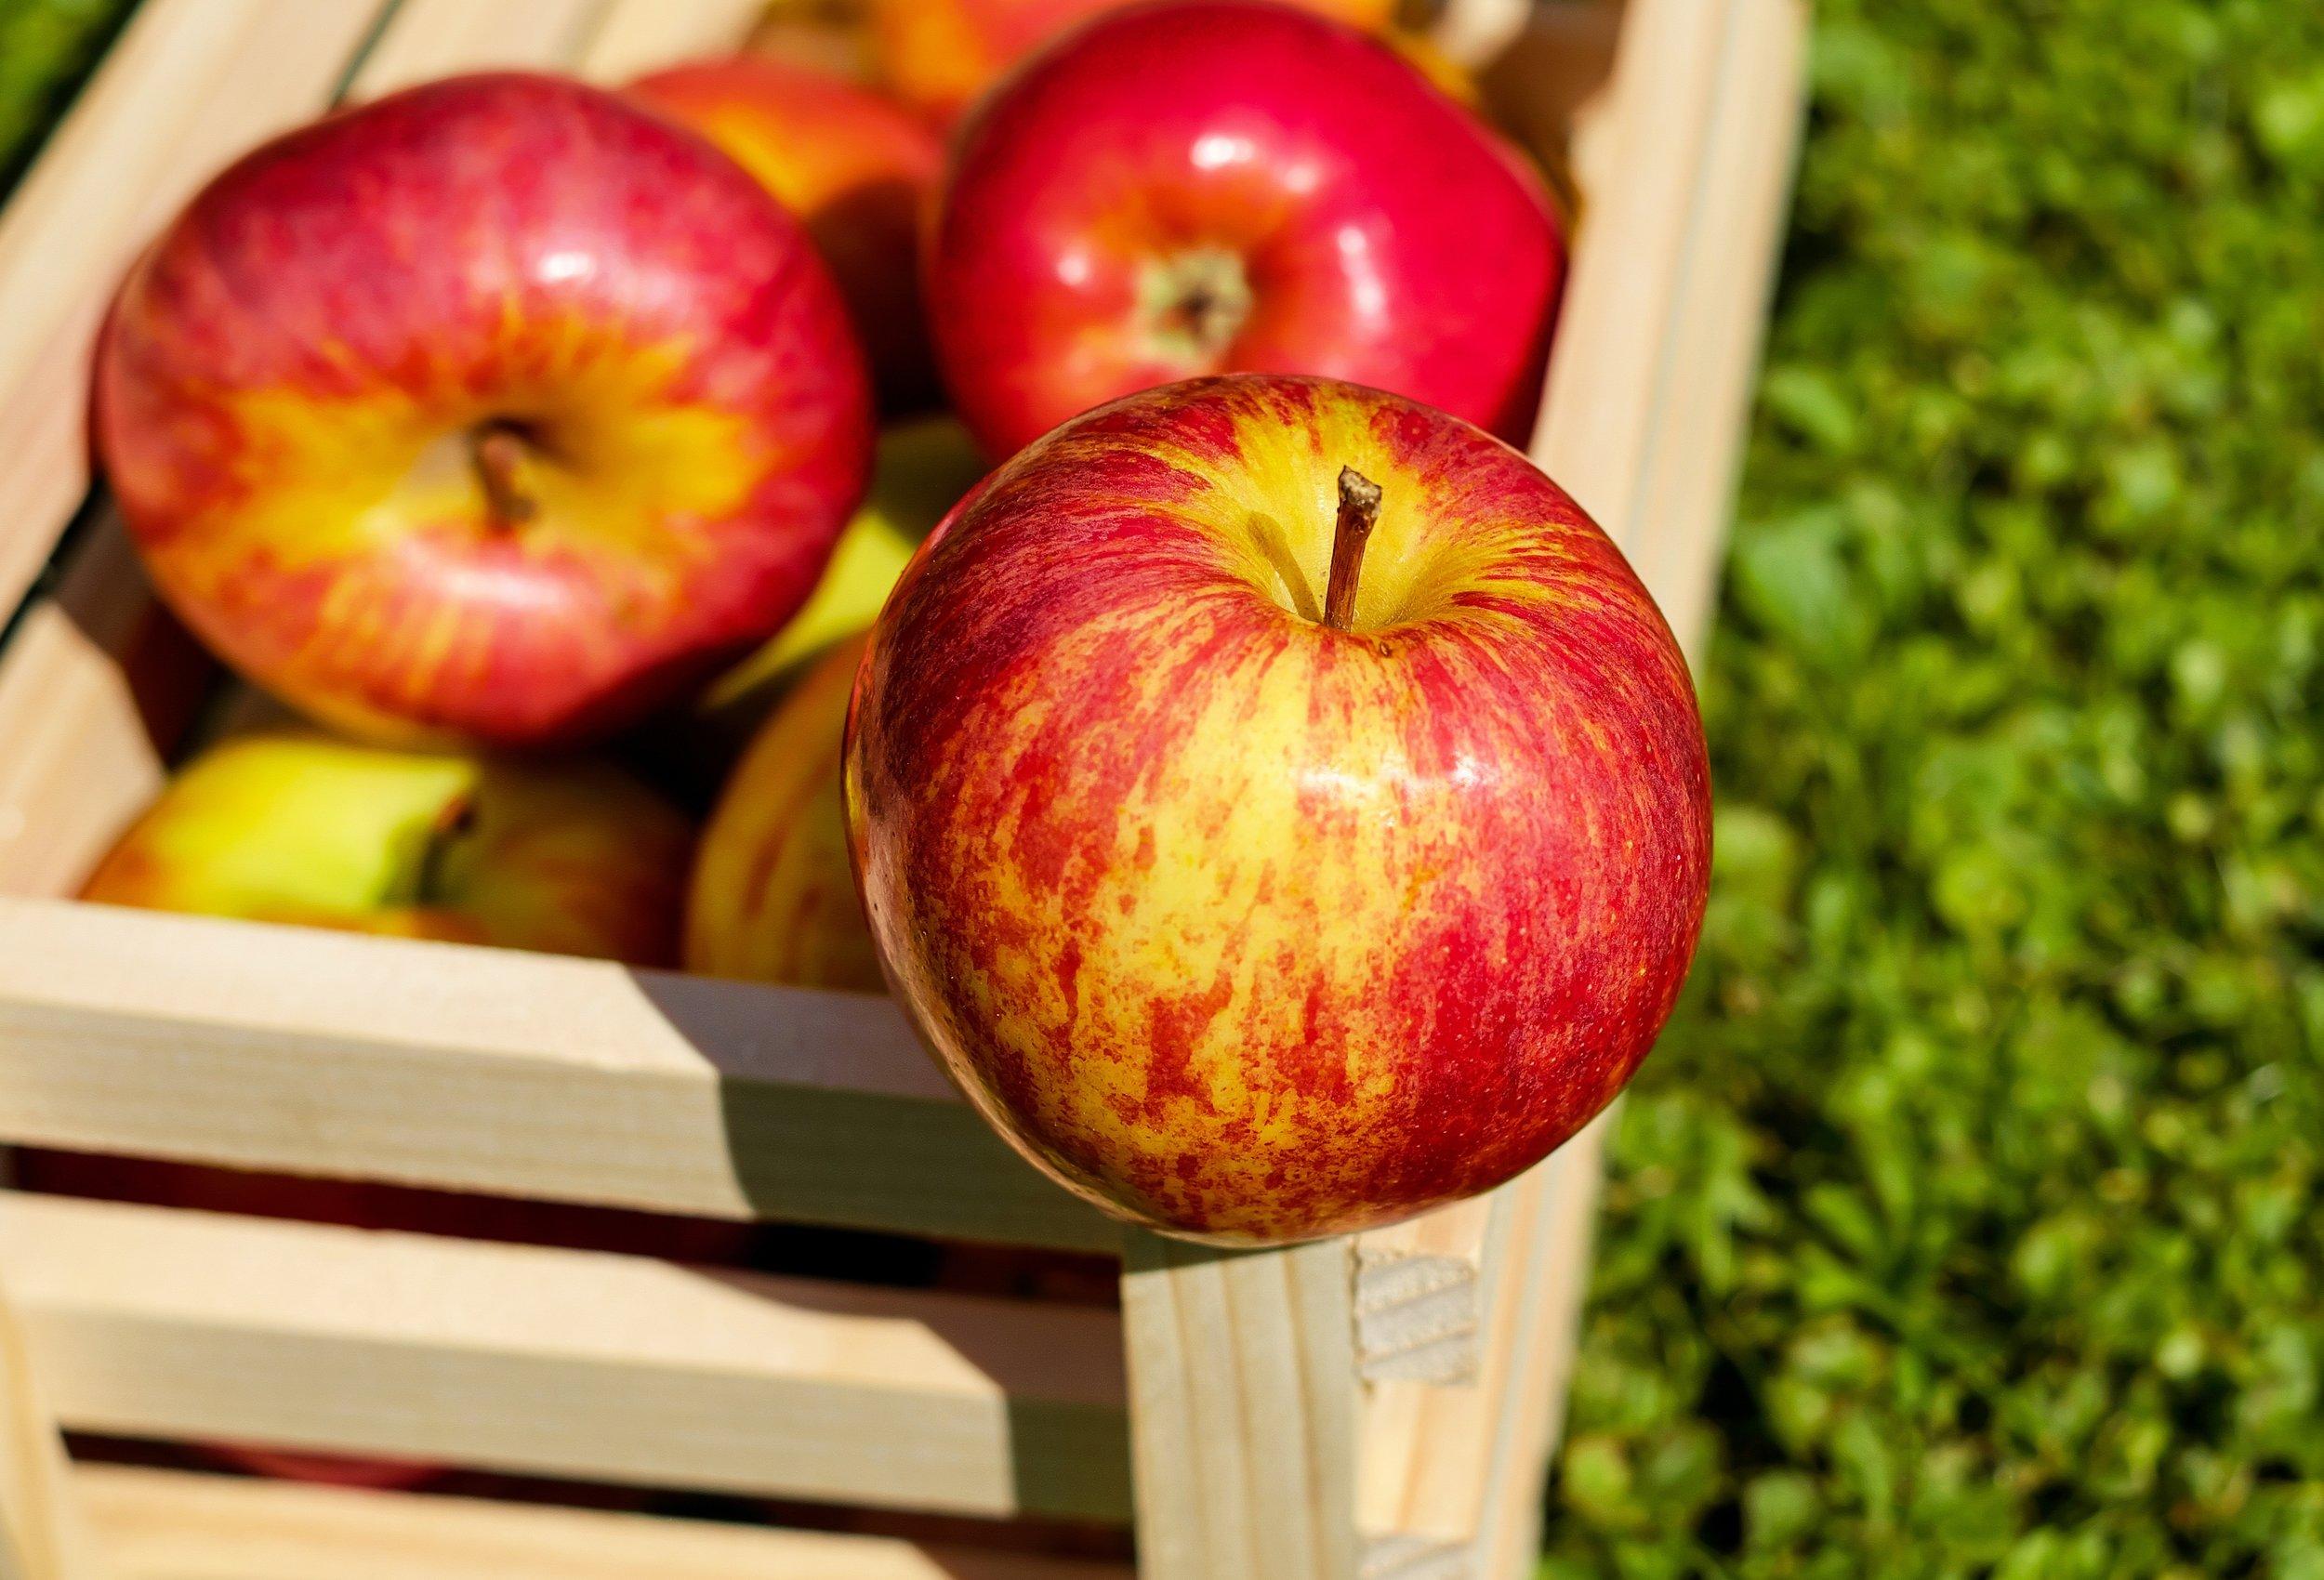 apple-red-fruit-ripe-144245.jpeg